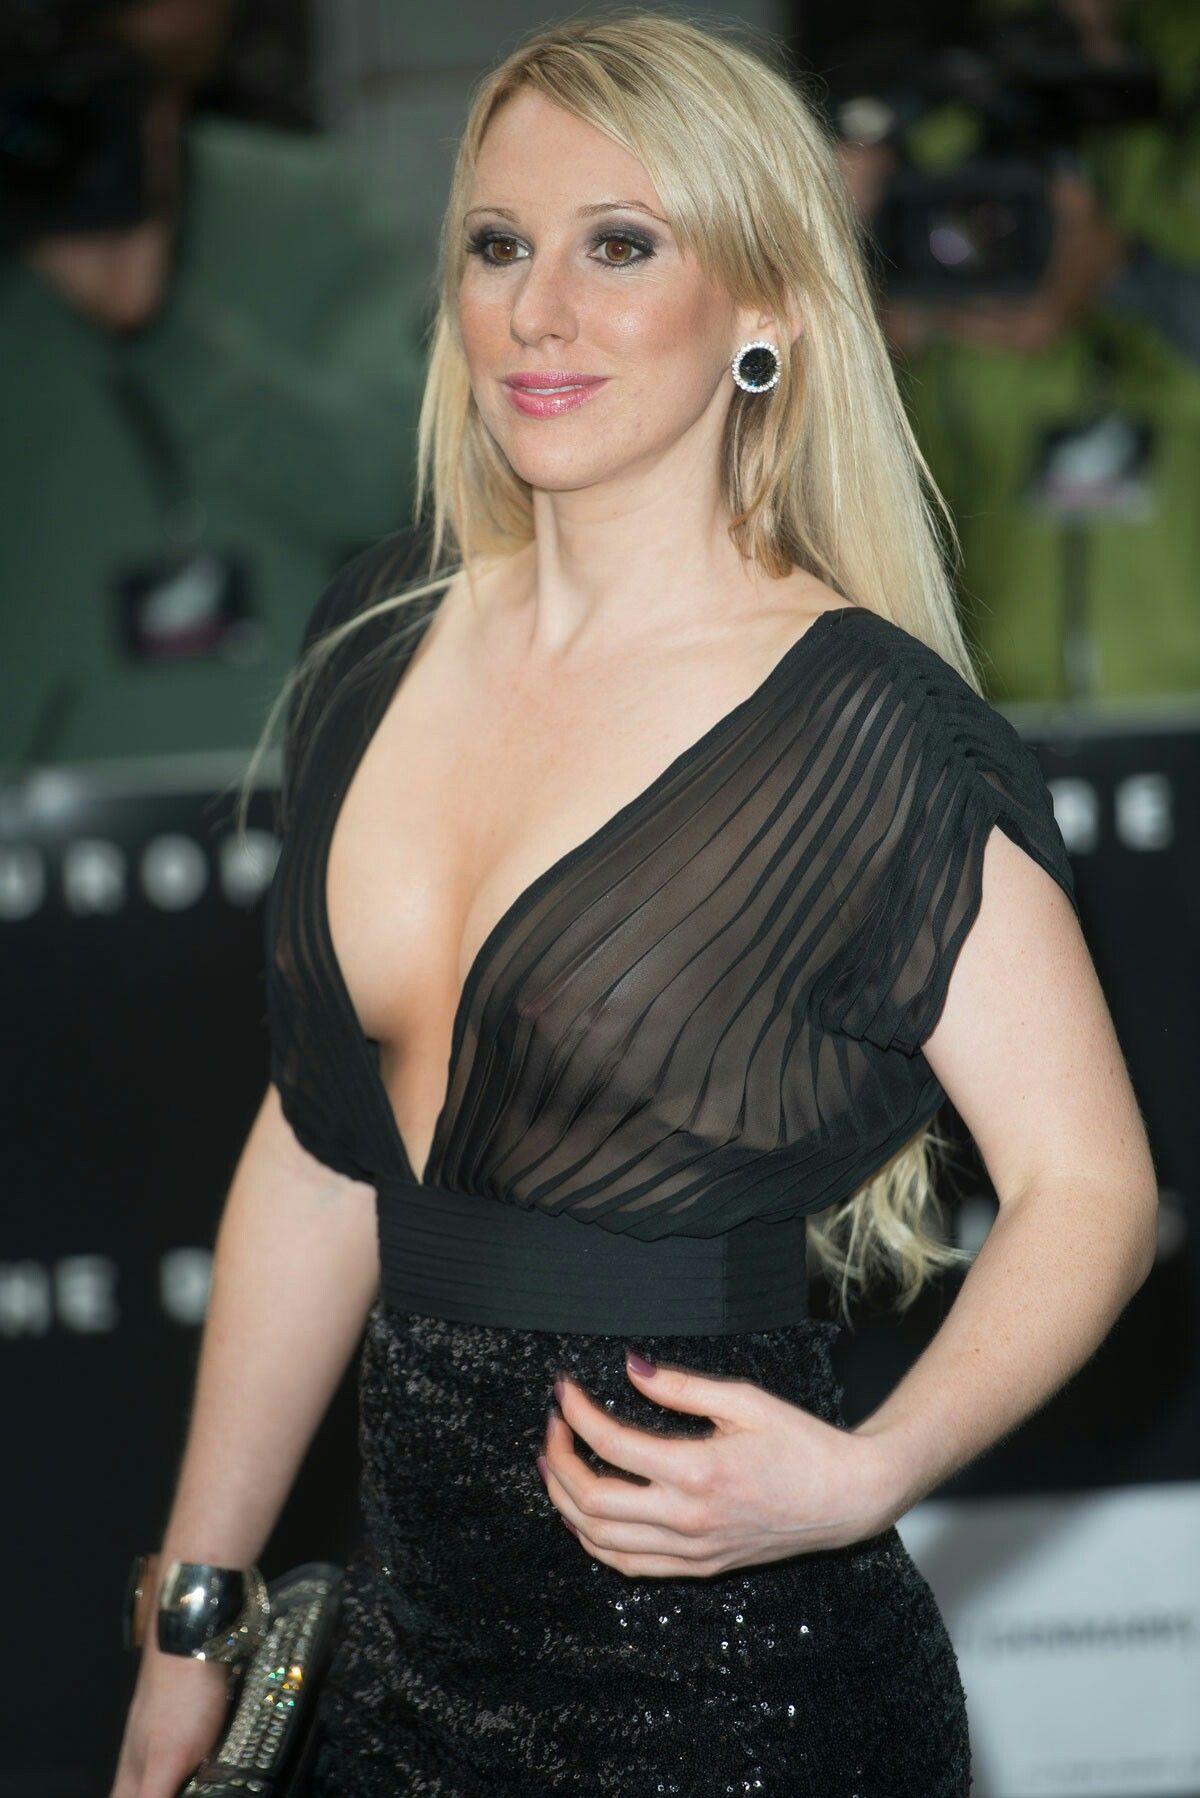 Celeb Paris Hilton naked pics, oops!. Photo #2.